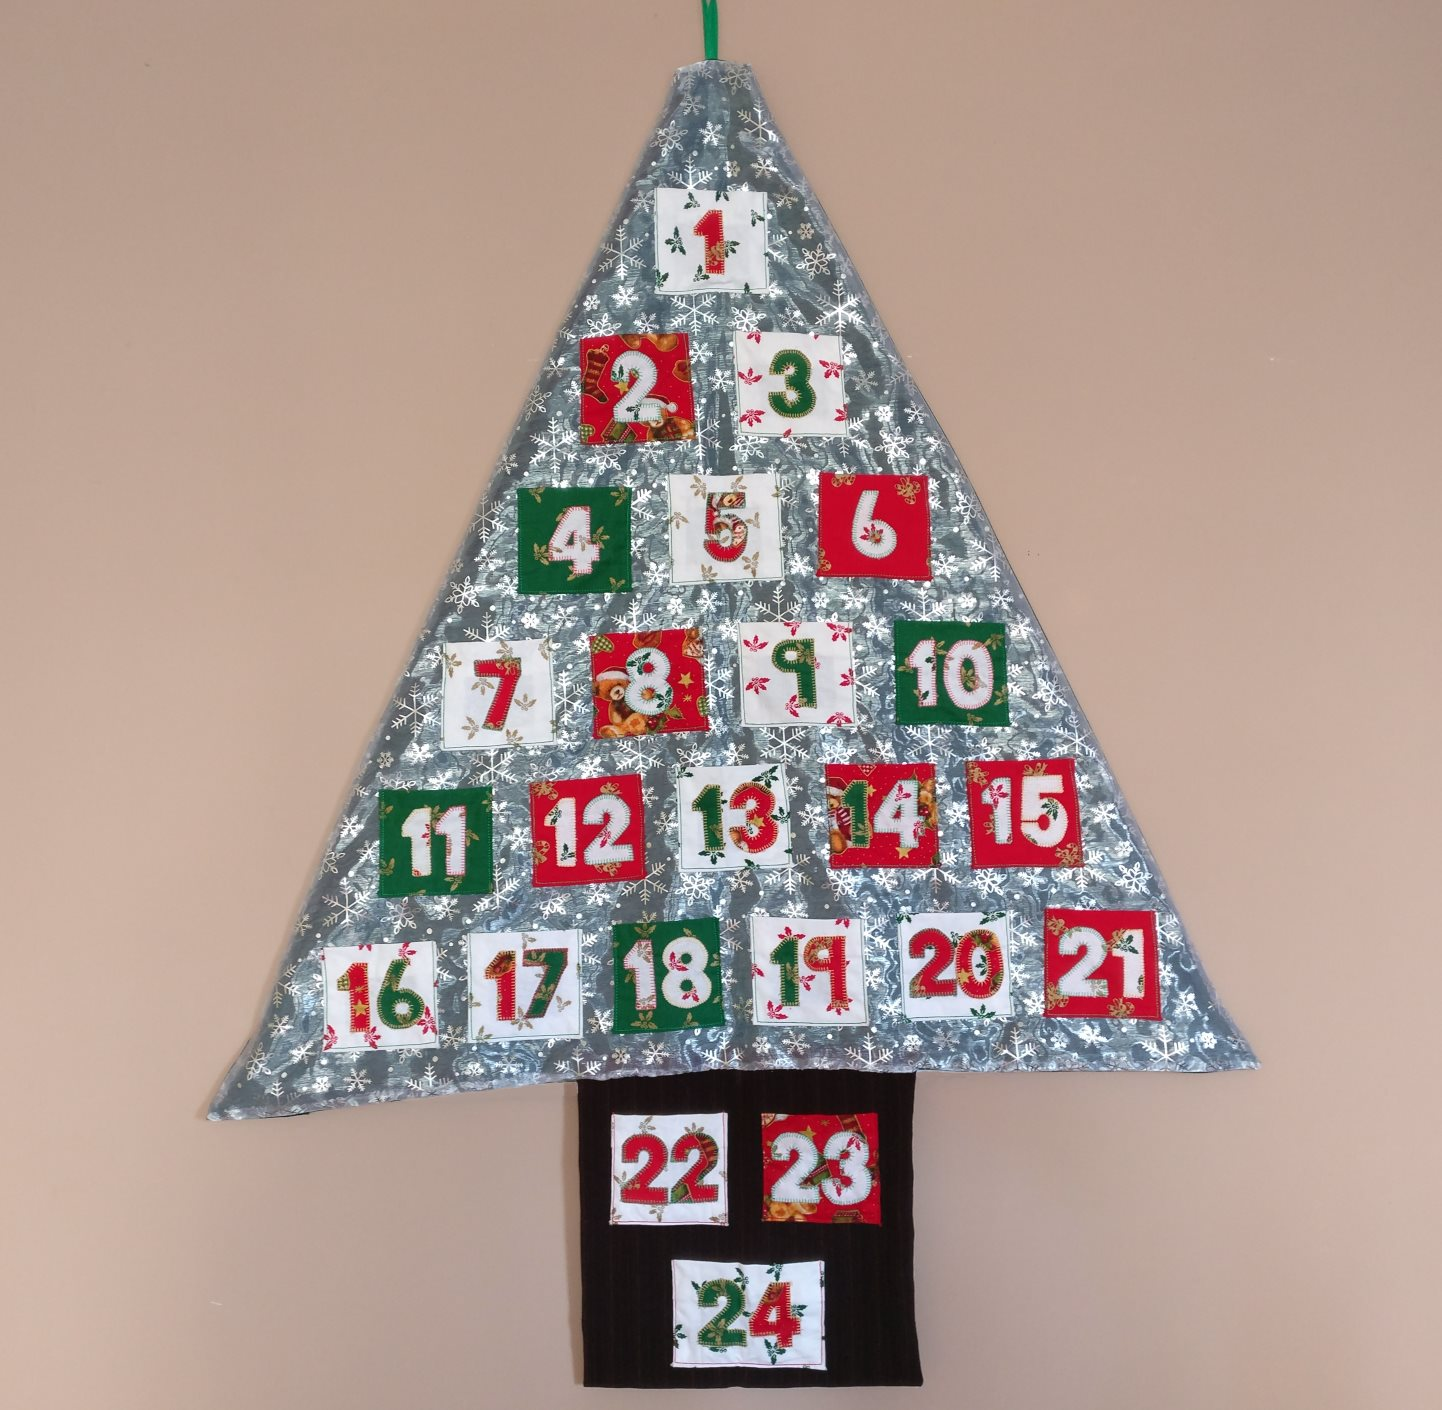 Finished Handmade Fabric Advent Calendar